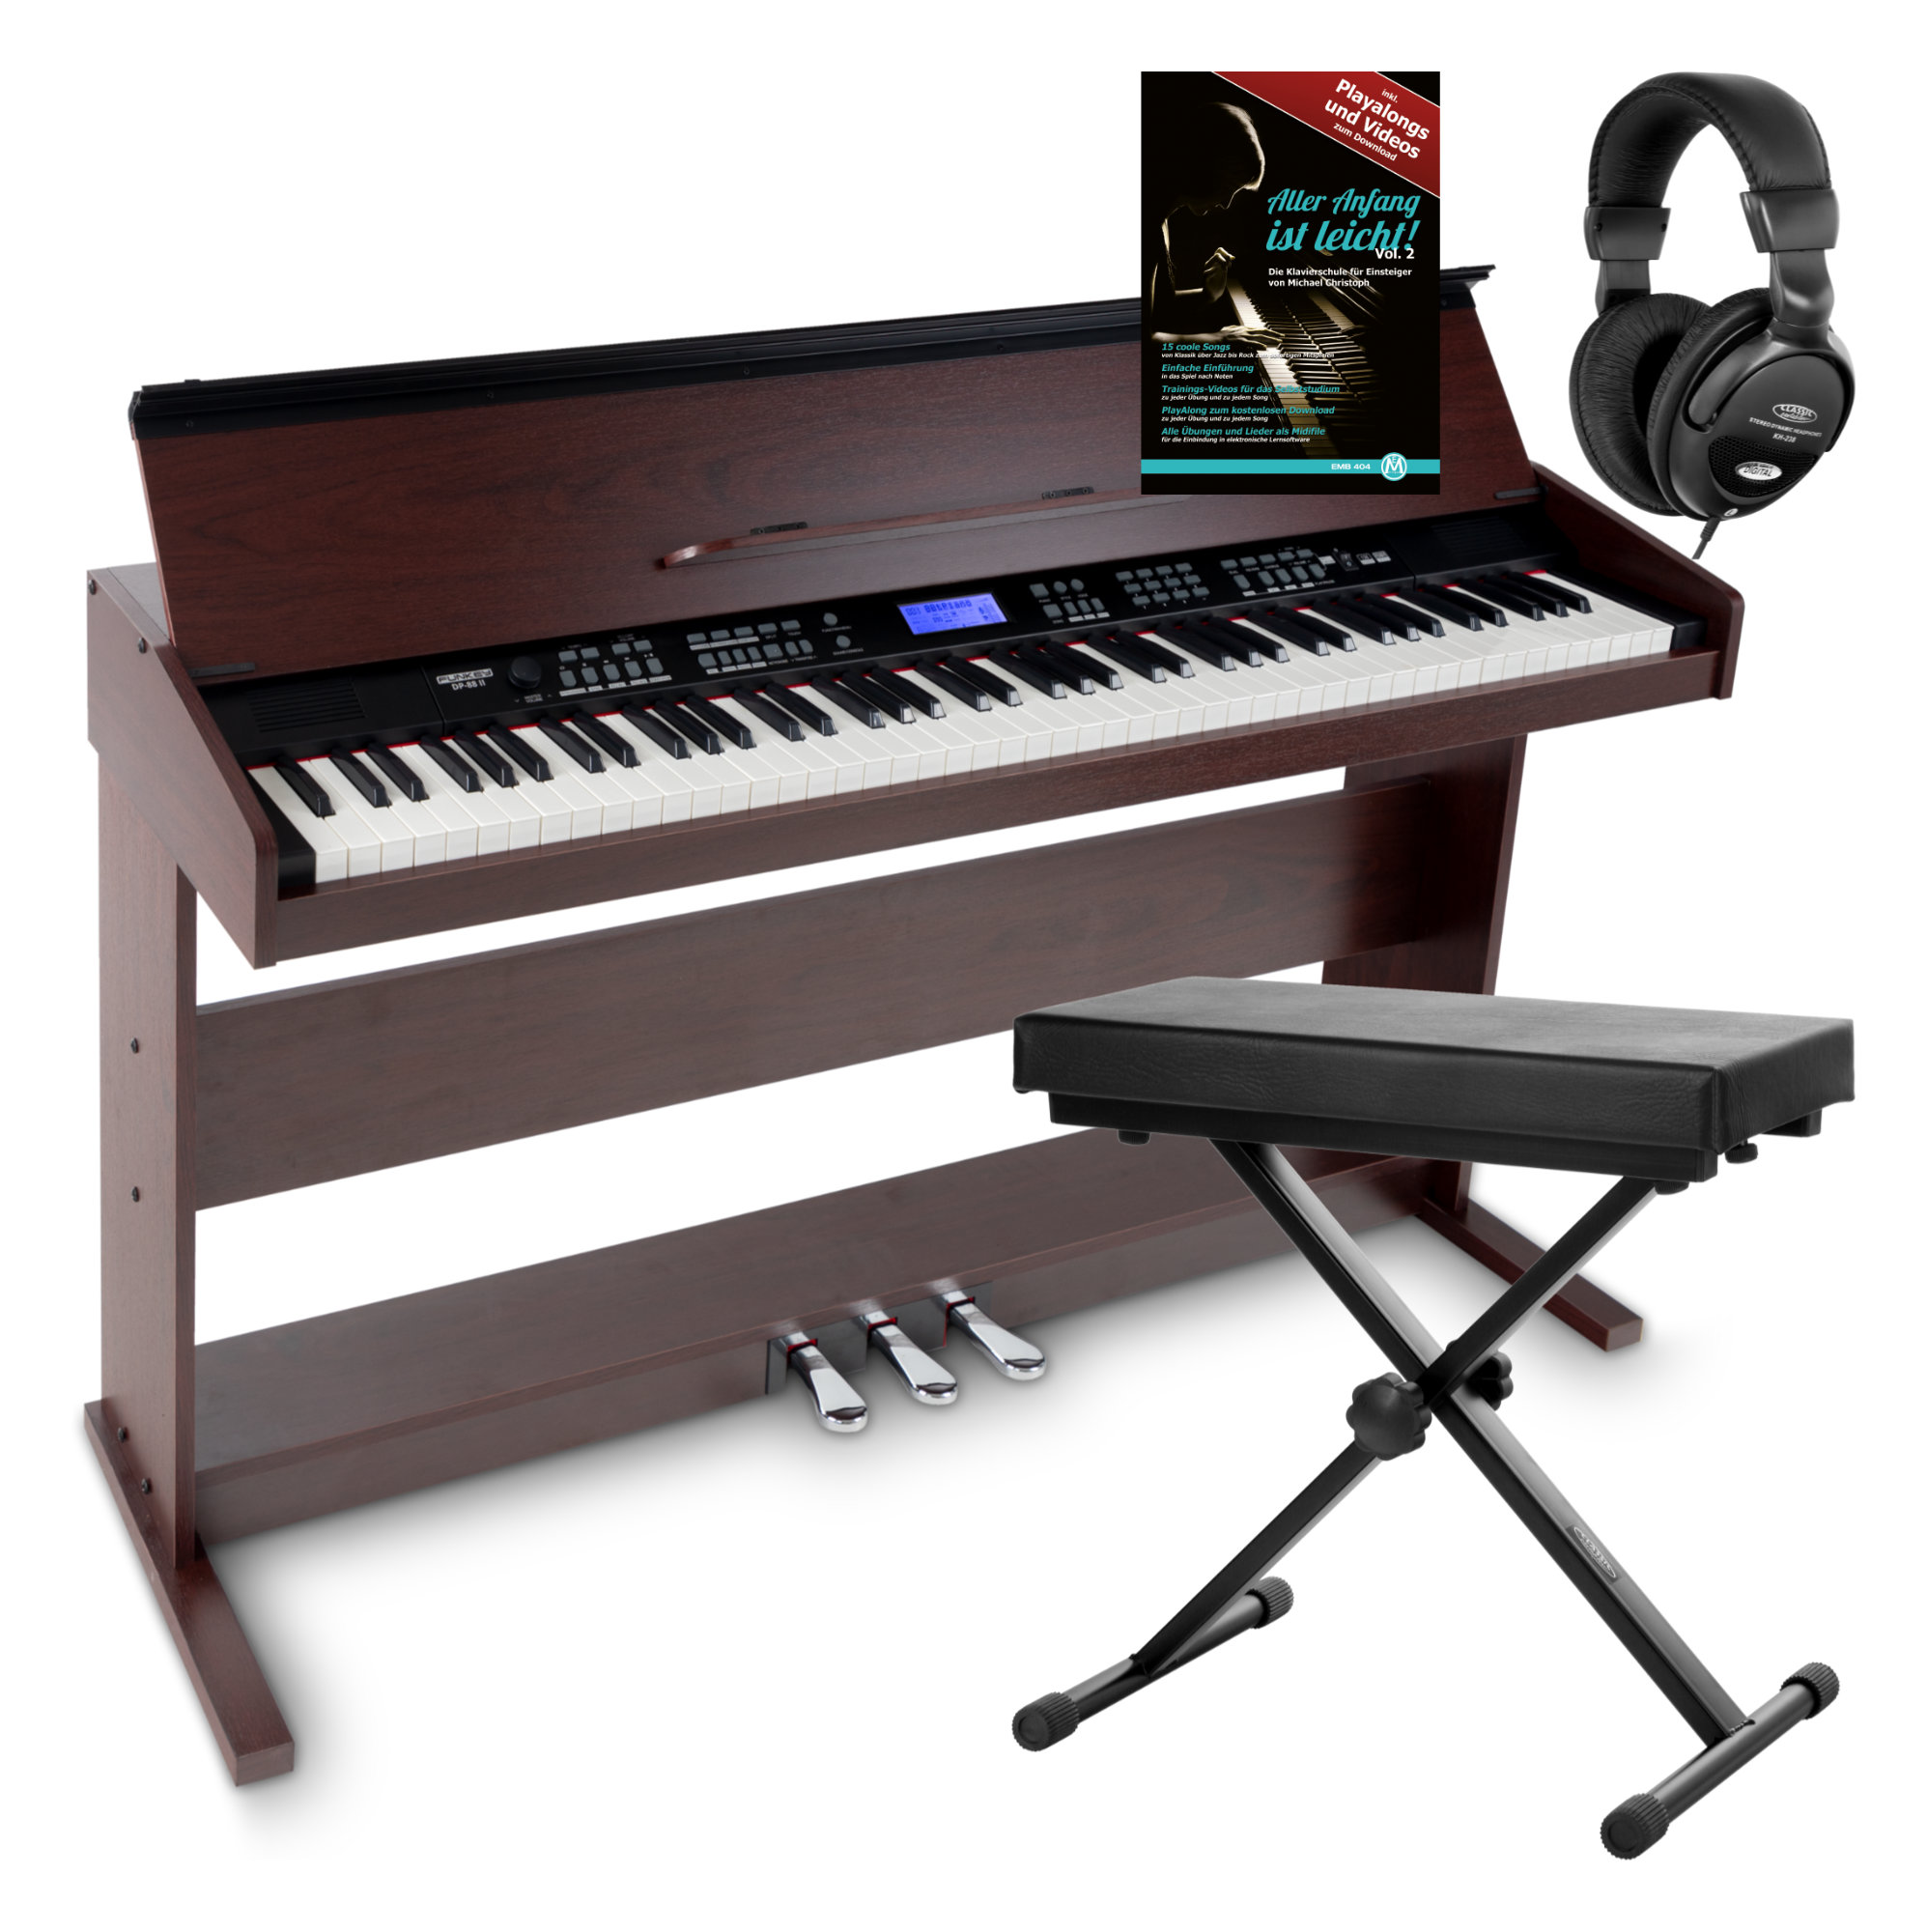 FunKey DP 88 II Digitalpiano braun Set mit Keyboardbank, Kopfhörer und Klavierschule